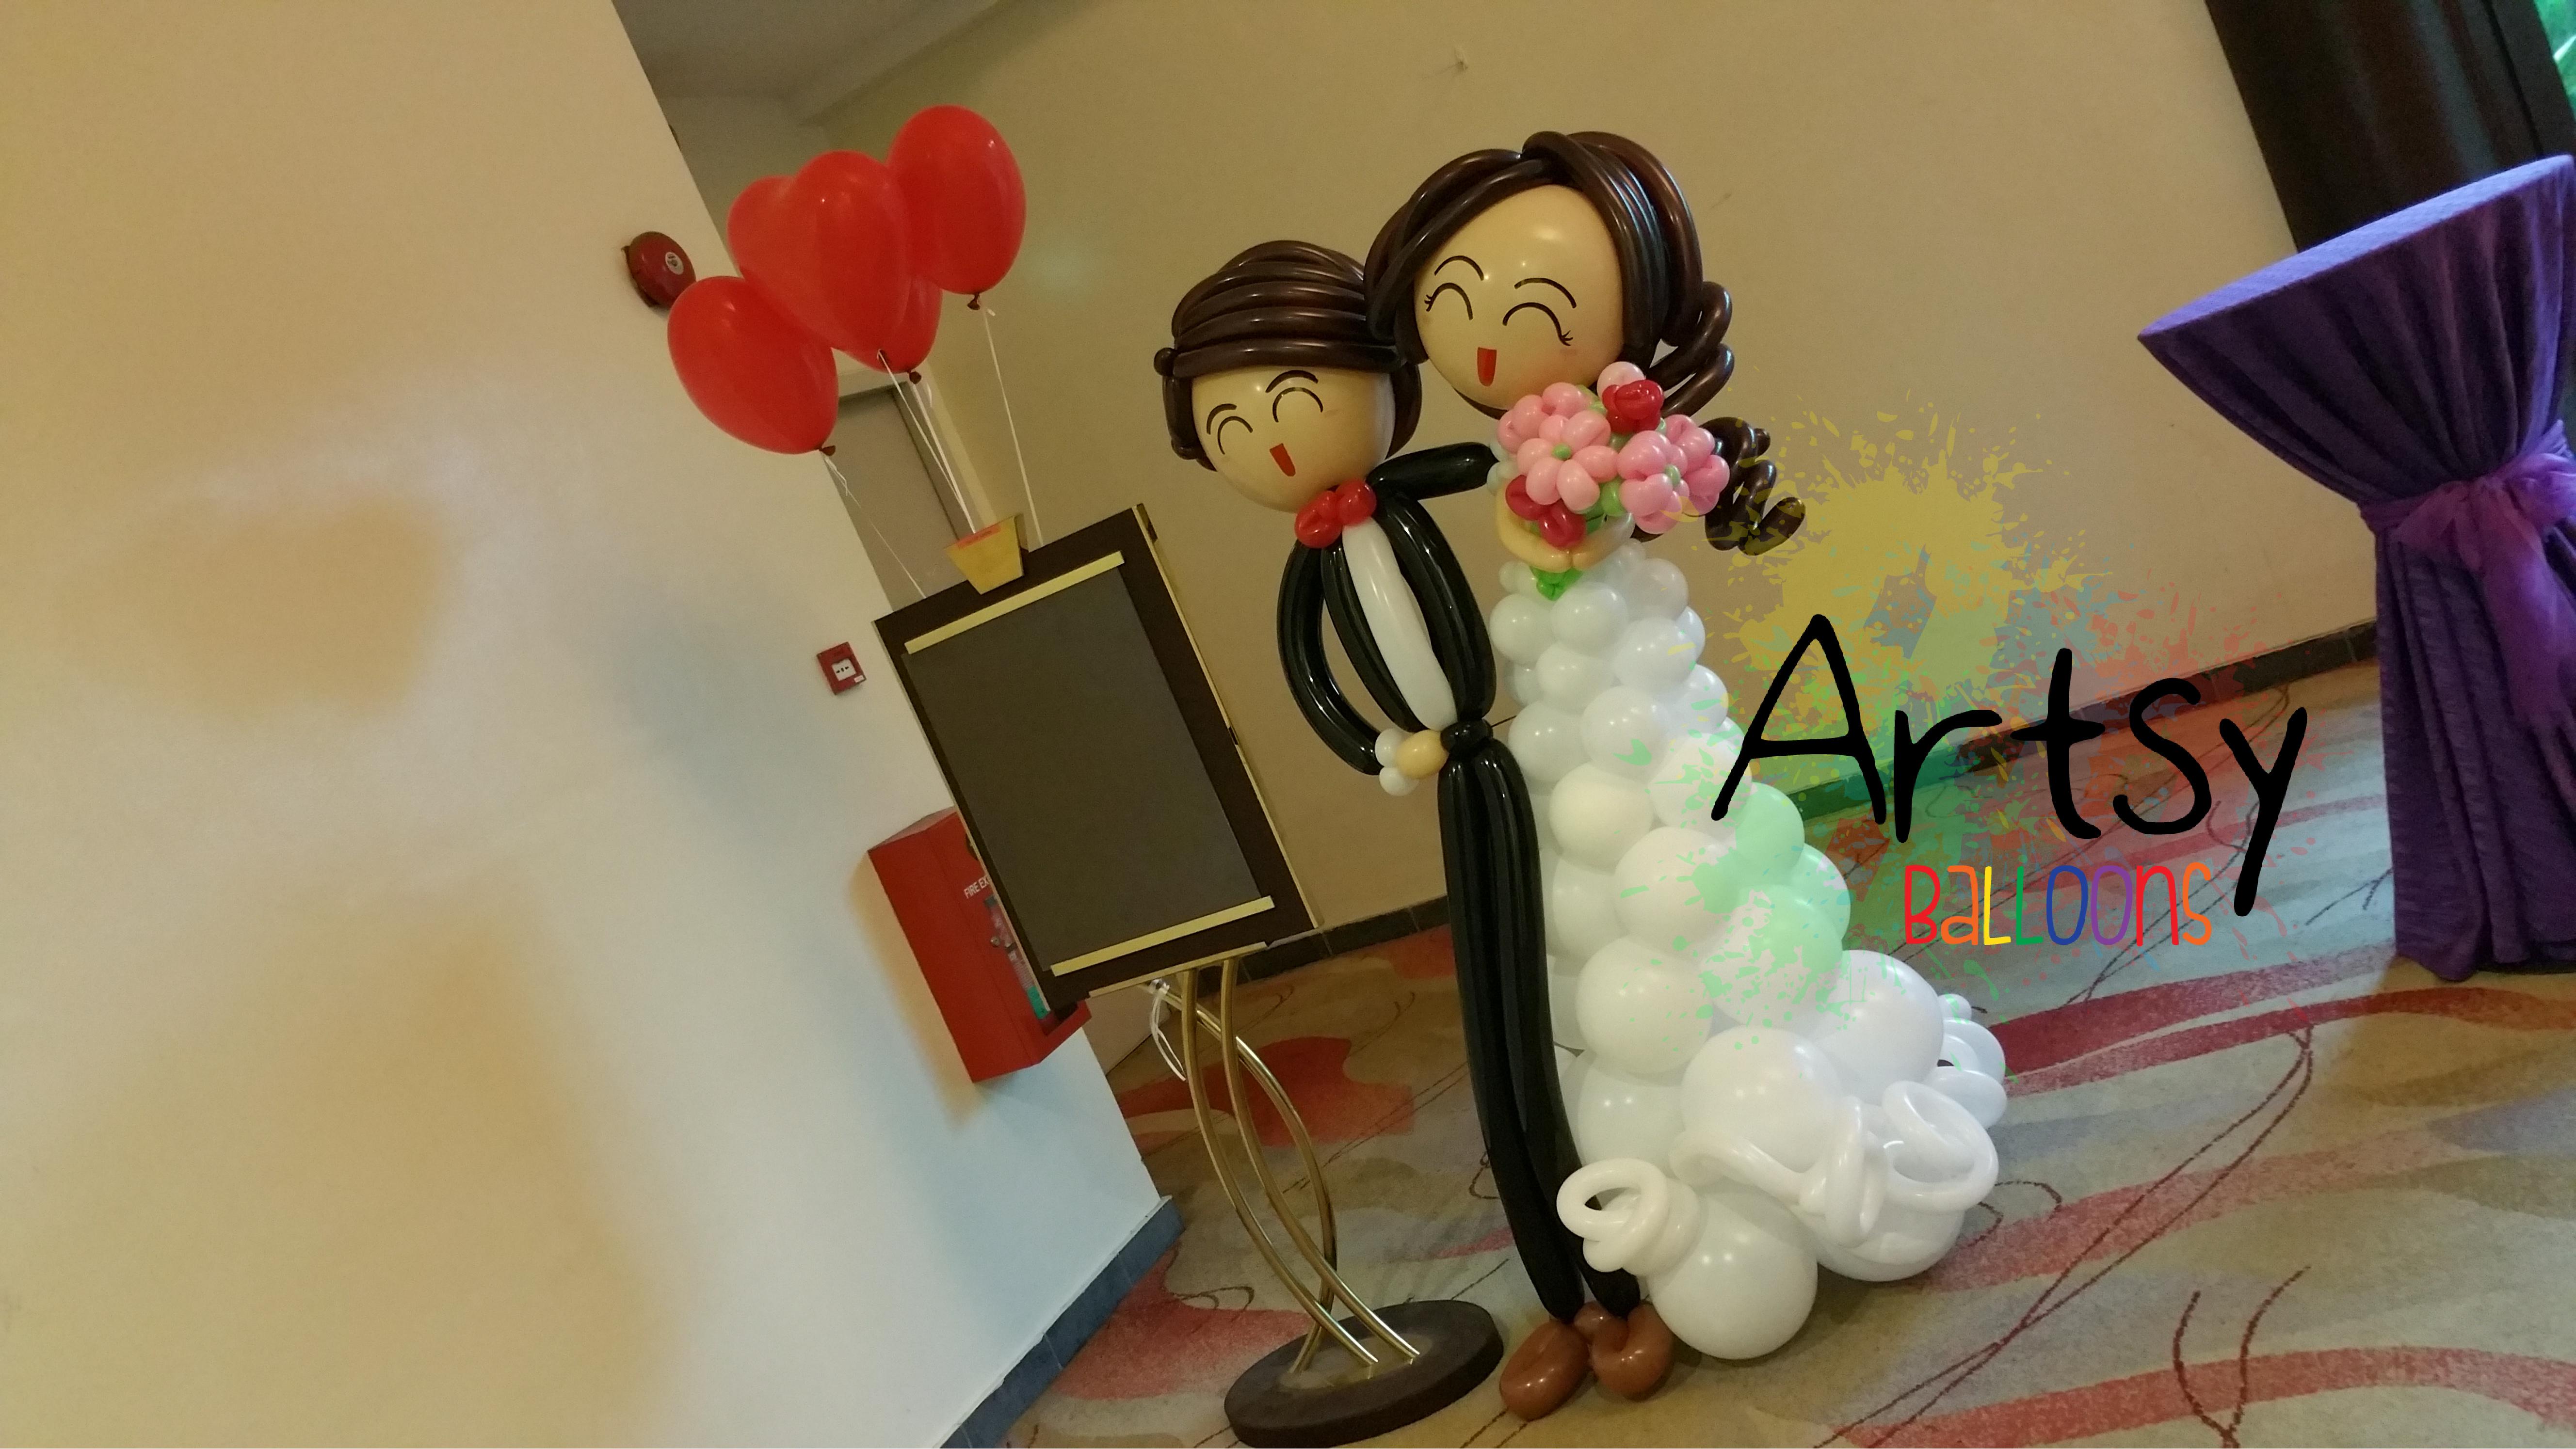 , Balloon Wedding Couple, Singapore Balloon Decoration Services - Balloon Workshop and Balloon Sculpting